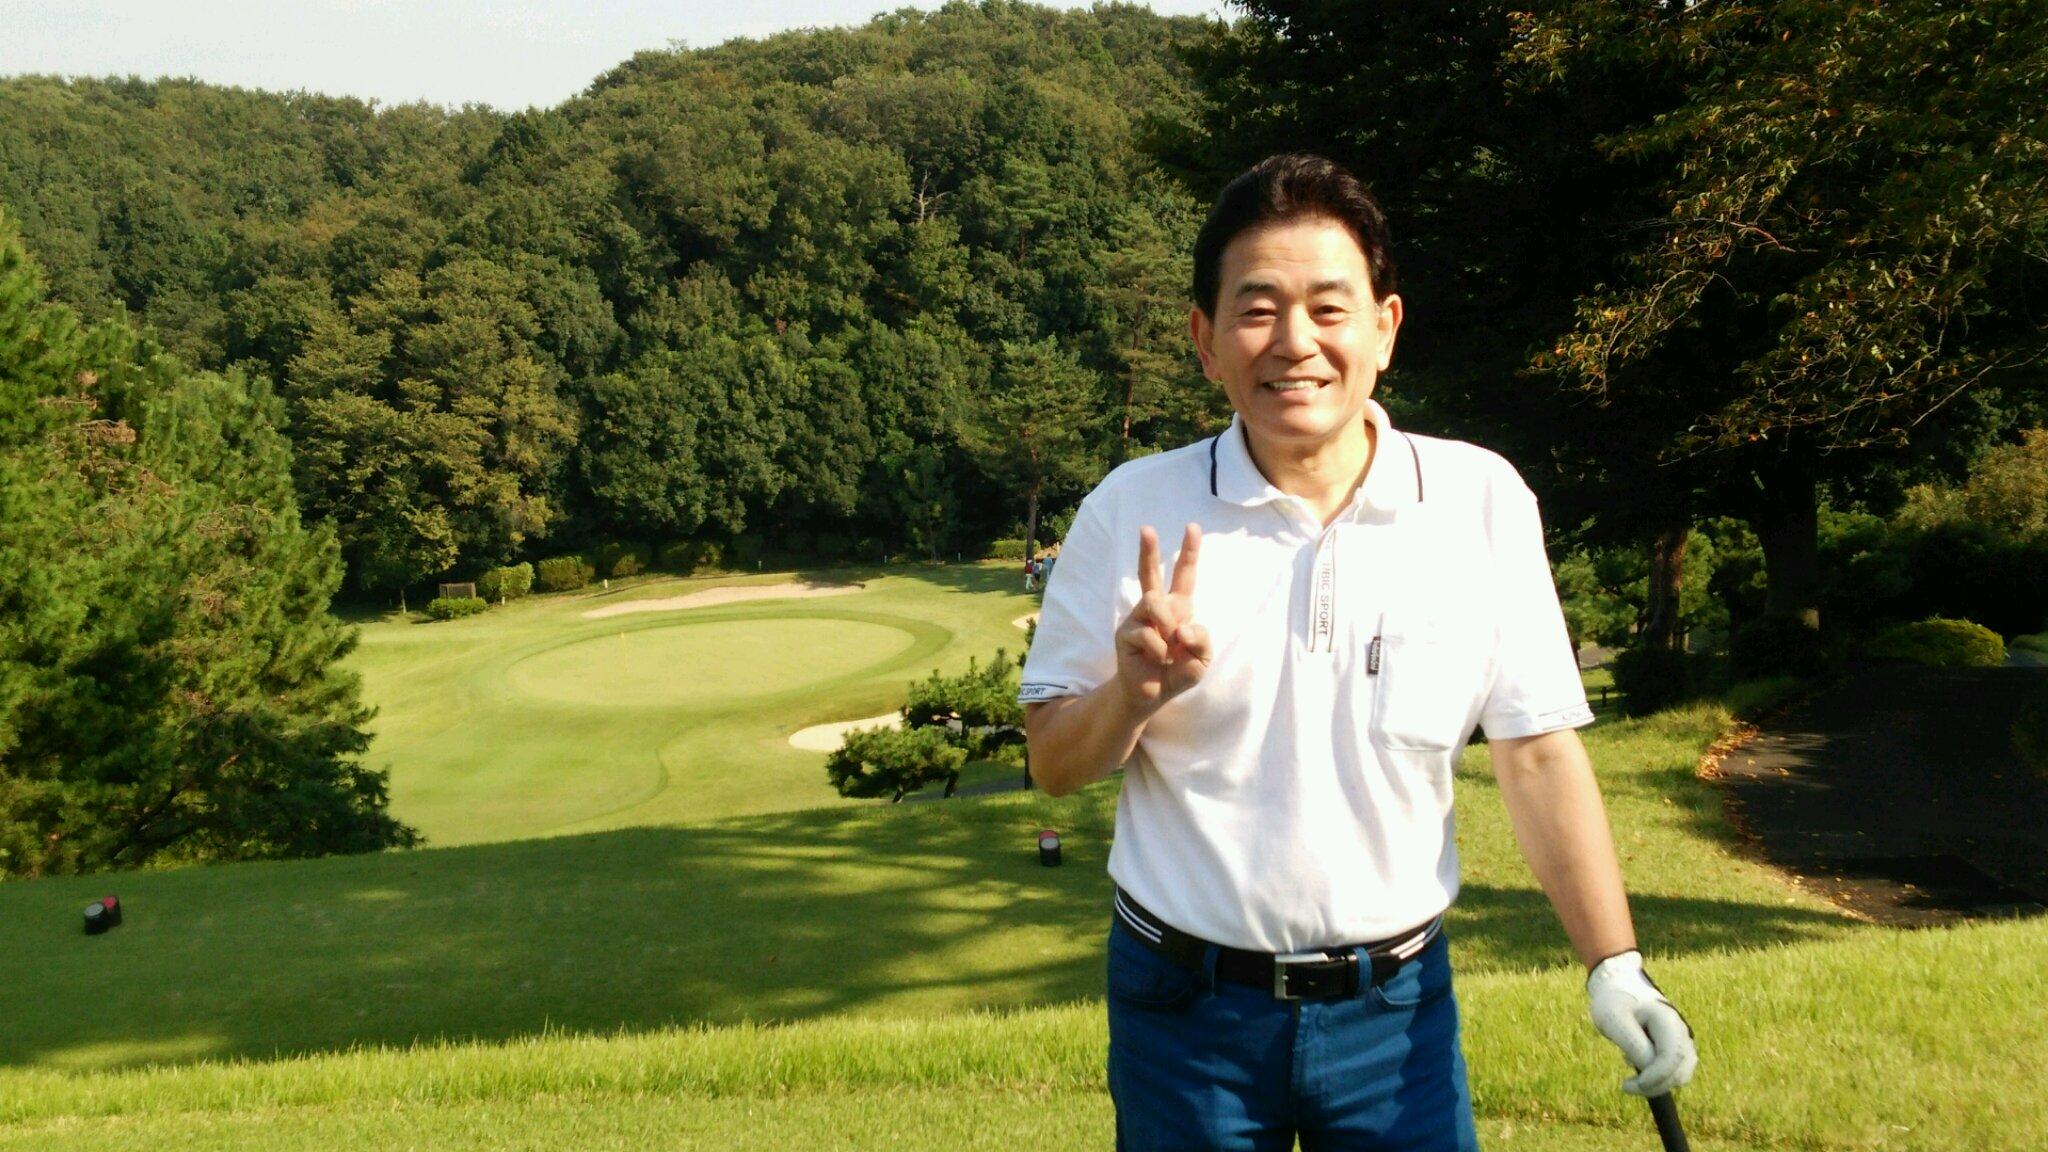 YK会ゴルフコンペで3位入賞!_e0119092_17065548.jpg